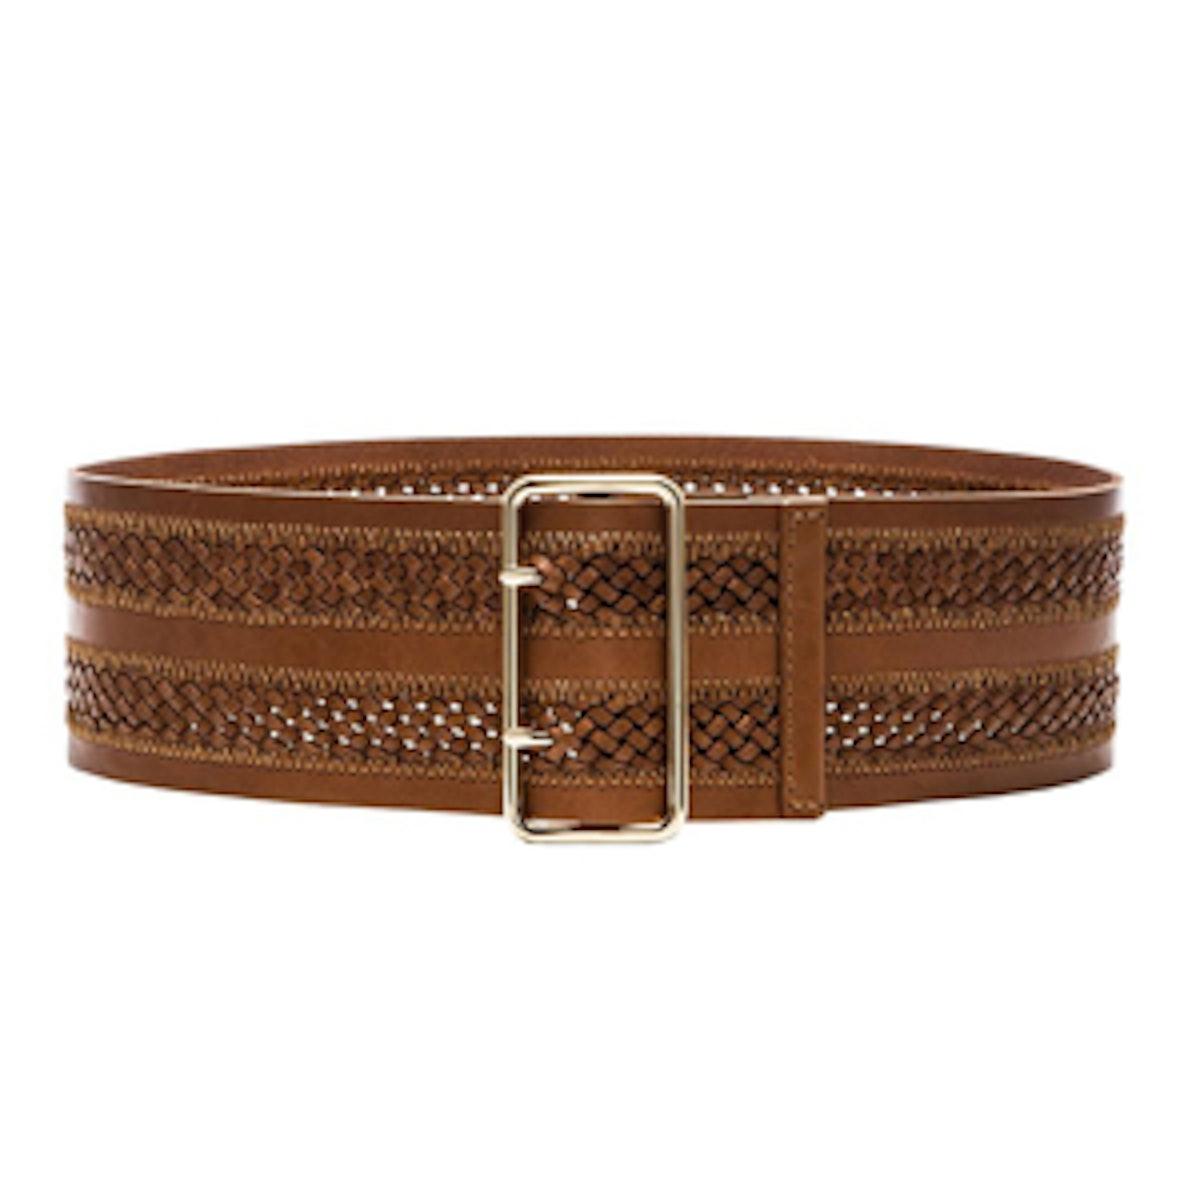 Wide Double-Braided Belt